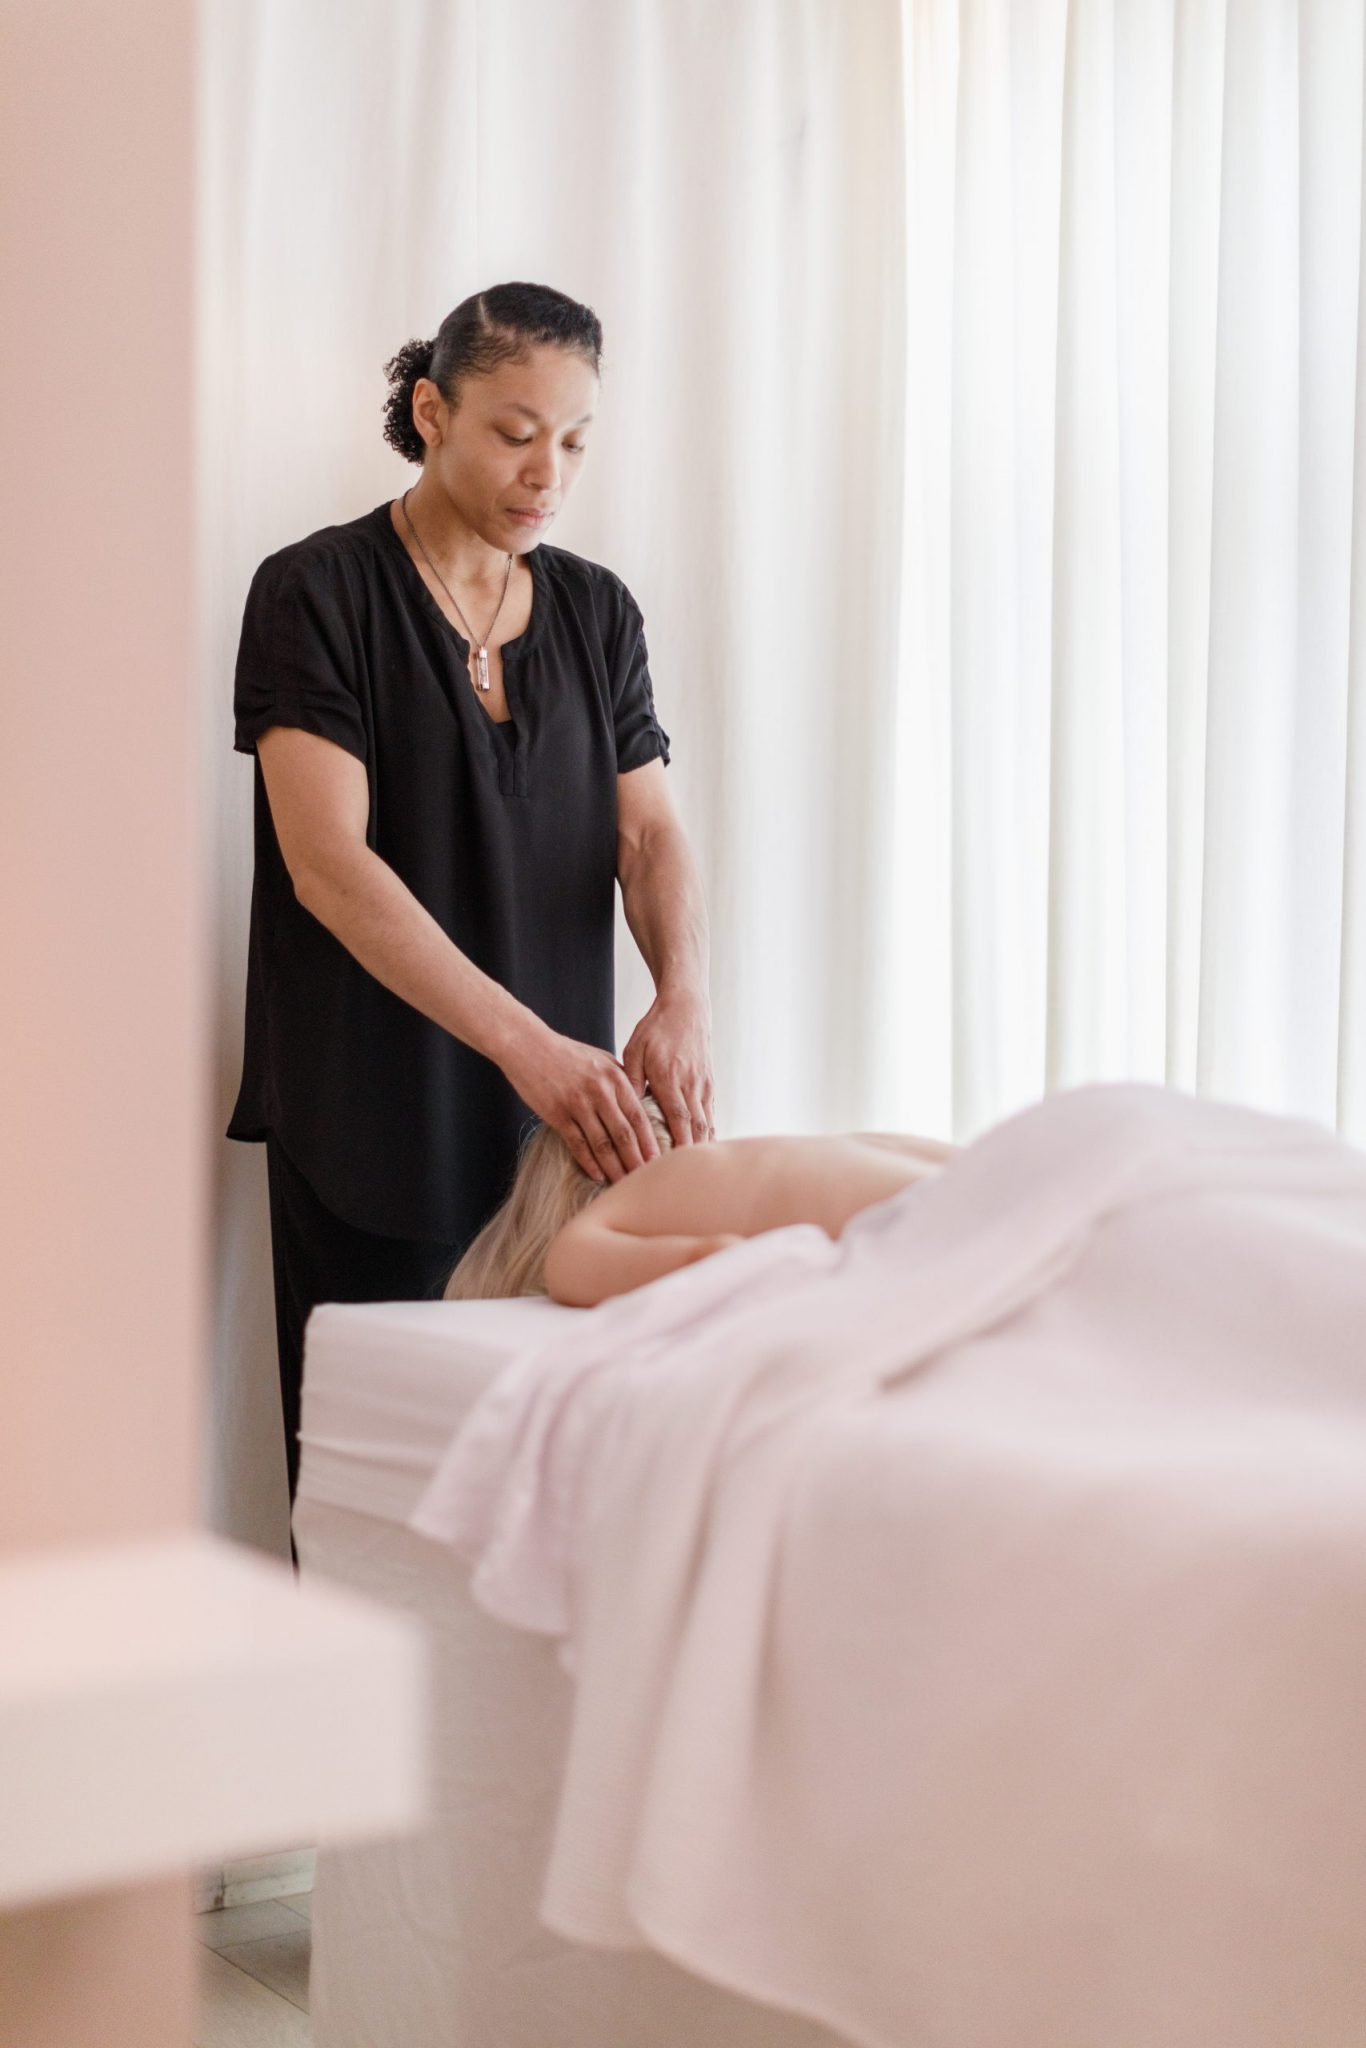 A person getting a massage